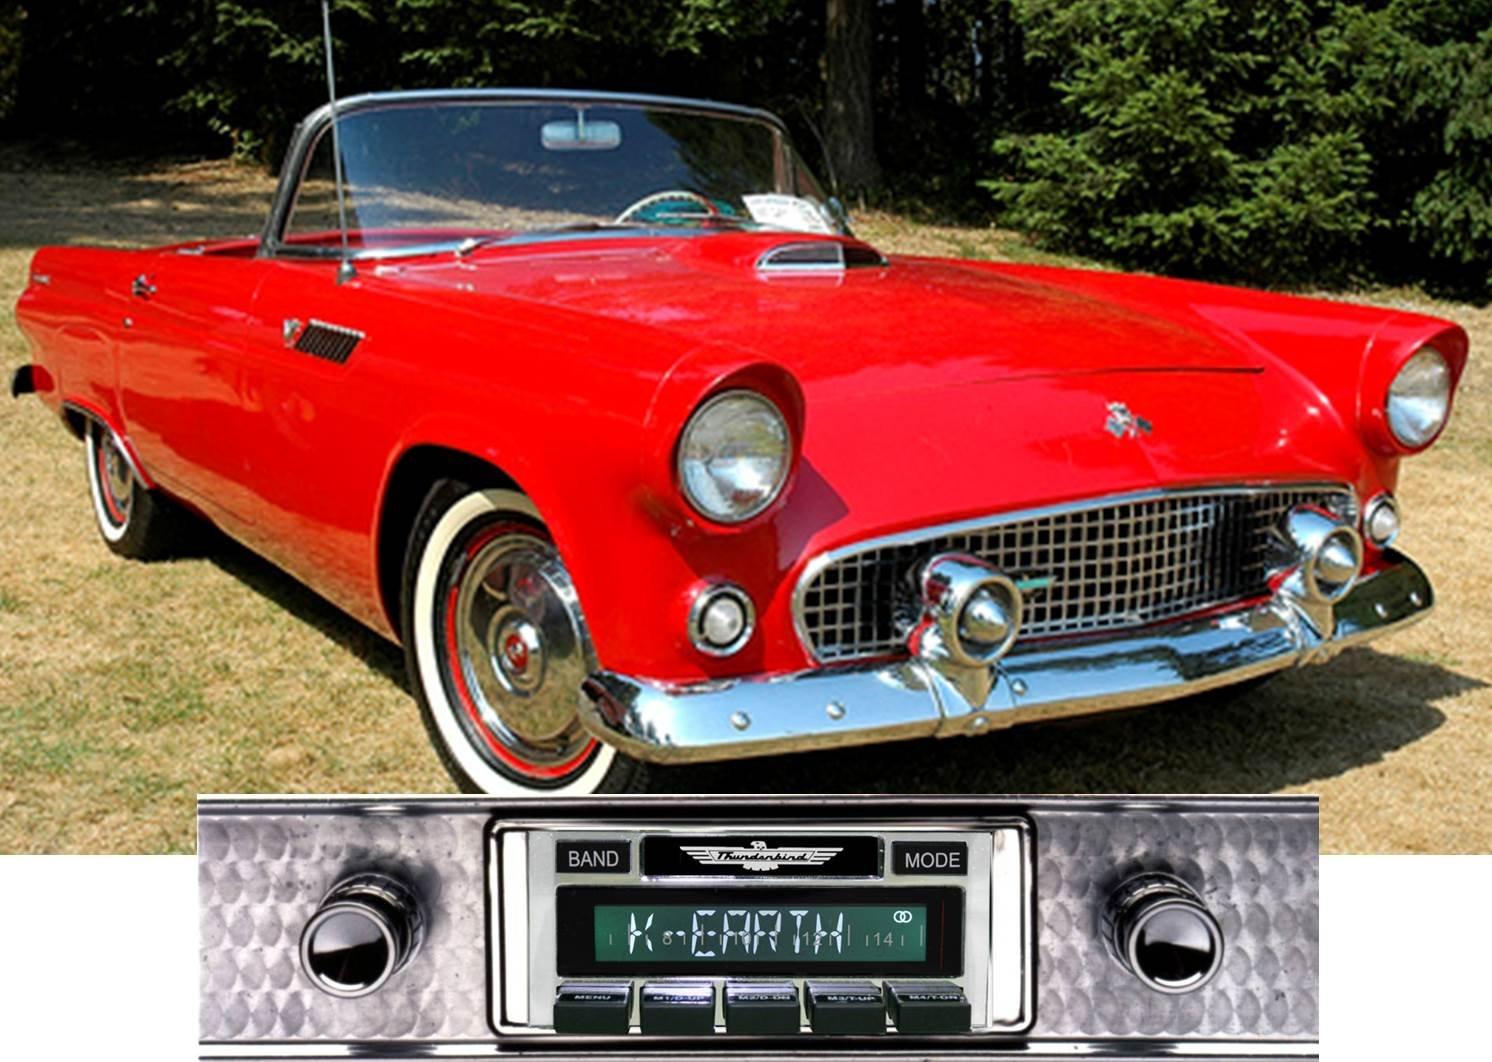 Custom Autosound Stereo Compatible With 1955 1957 Ford F100 Radio Install Thunderbird Usa 630 Ii High Power 300 Watt Am Fm Car Electronics